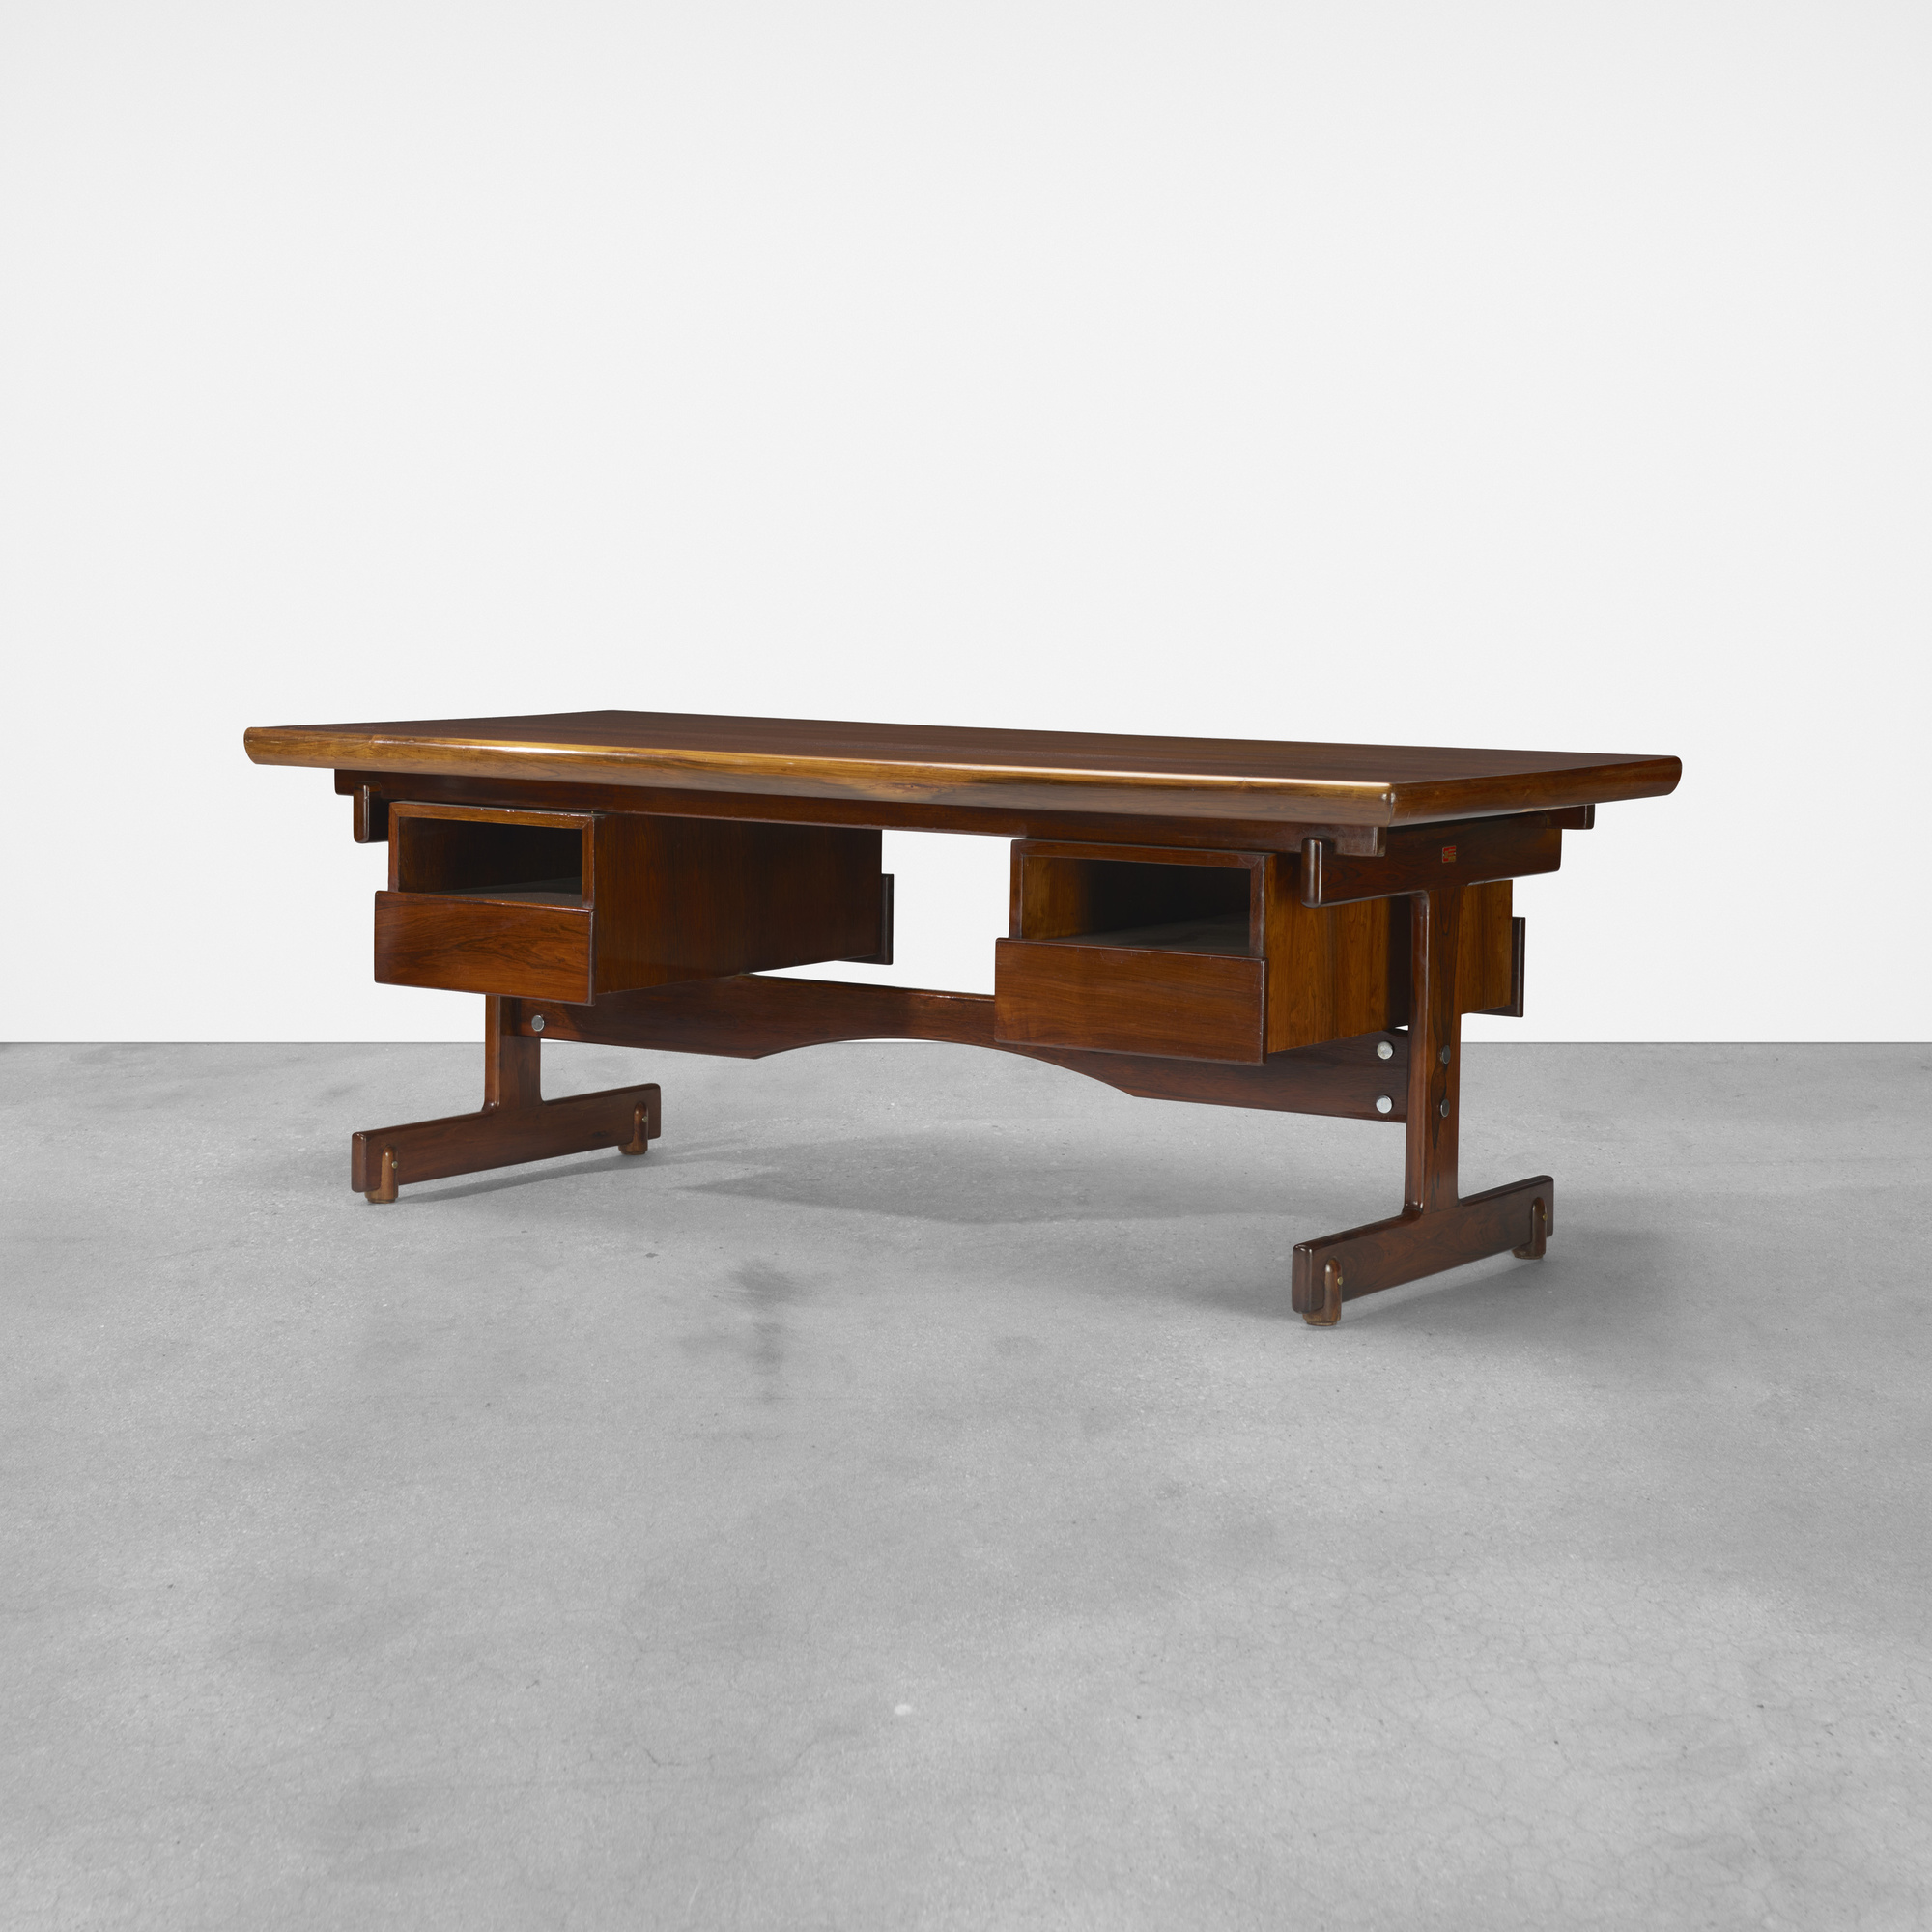 171: Sergio Rodrigues / Gordon desk (1 of 4)